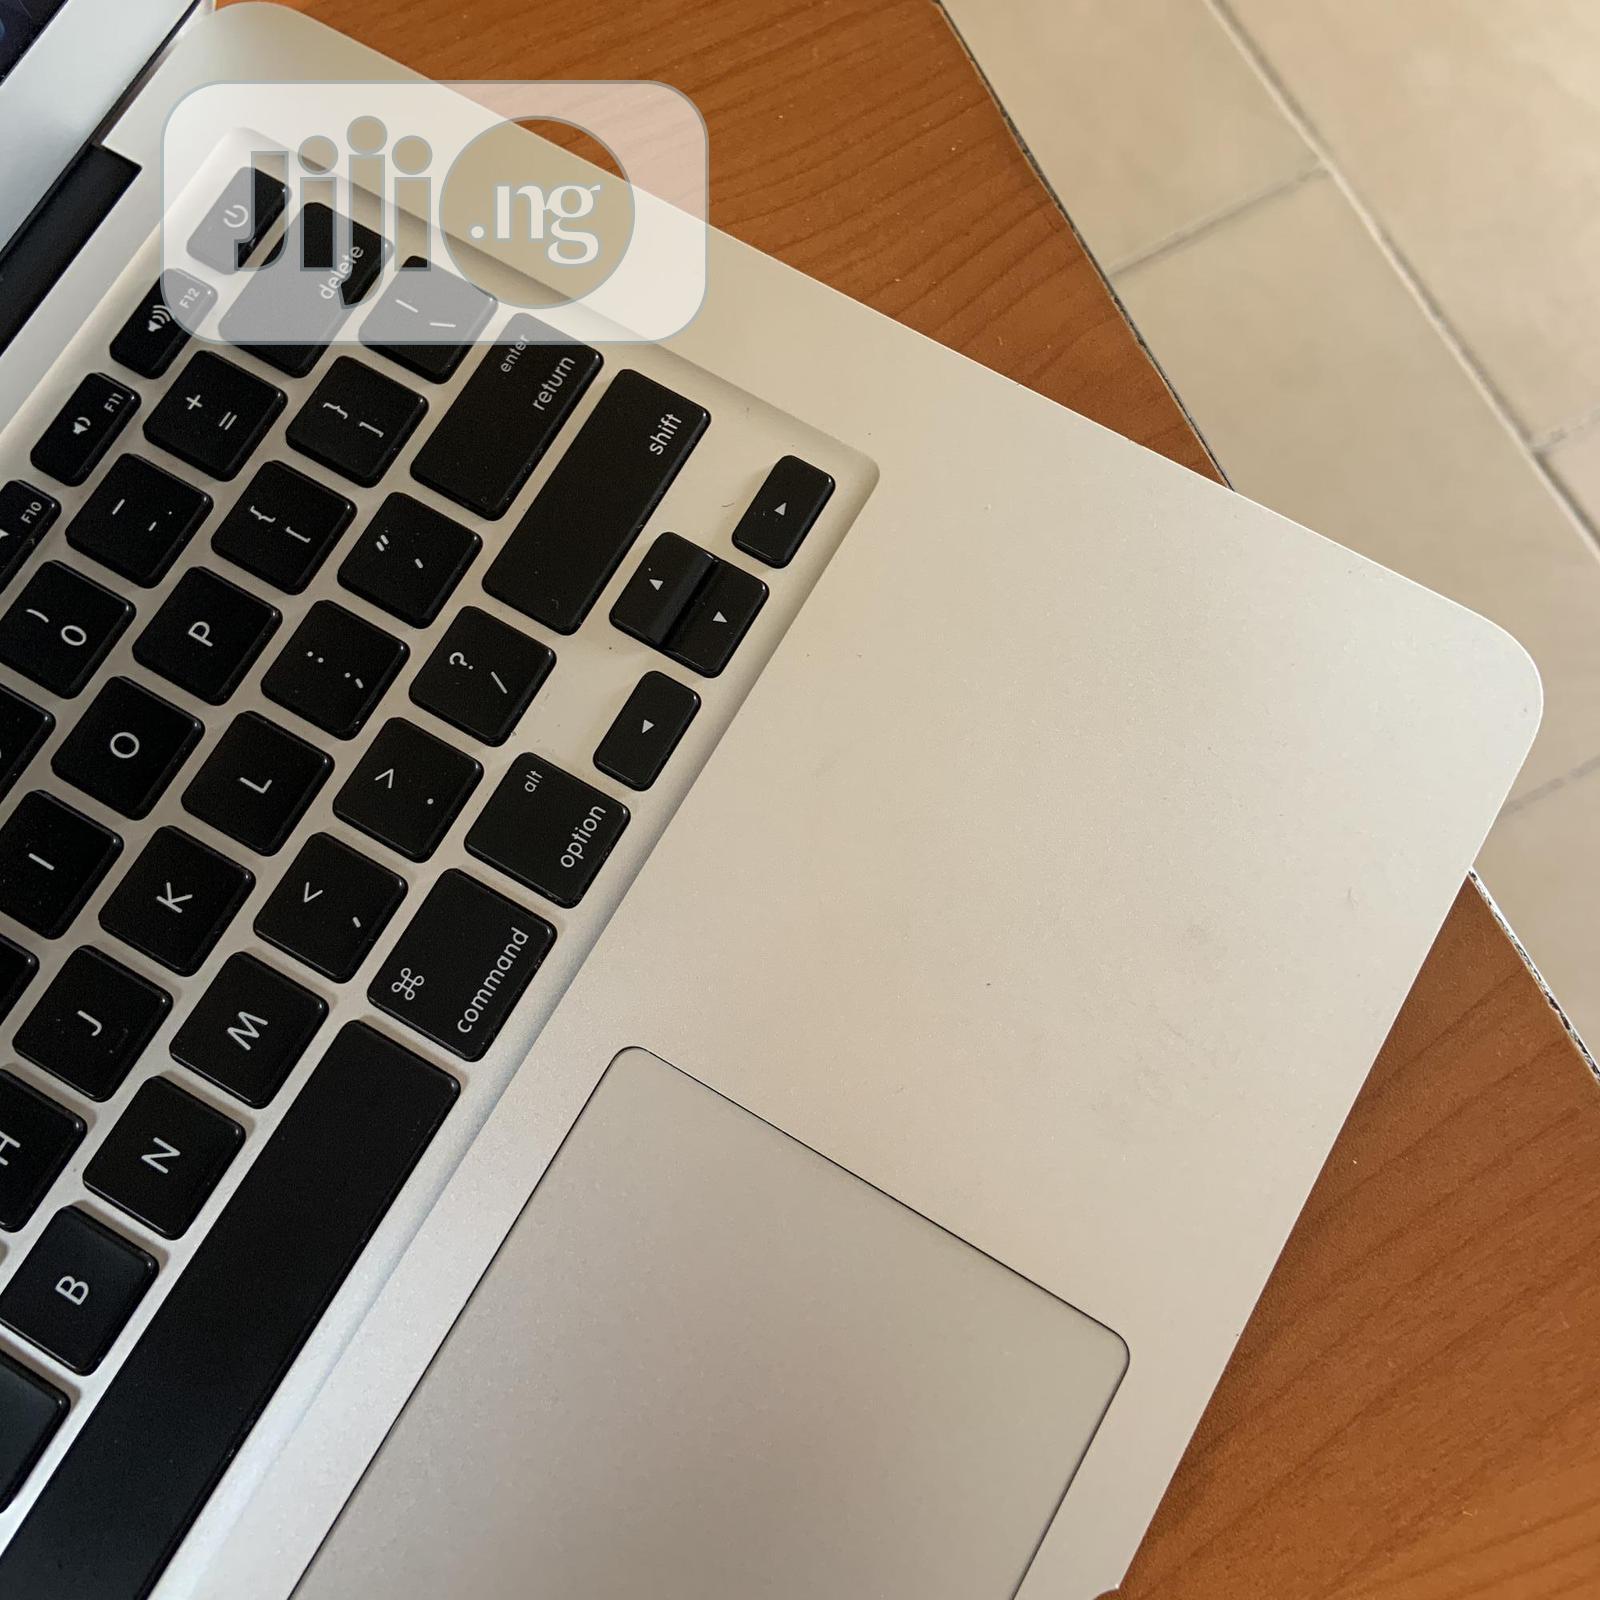 Laptop Apple MacBook Air 8GB Intel Core I5 256GB | Laptops & Computers for sale in Ikeja, Lagos State, Nigeria